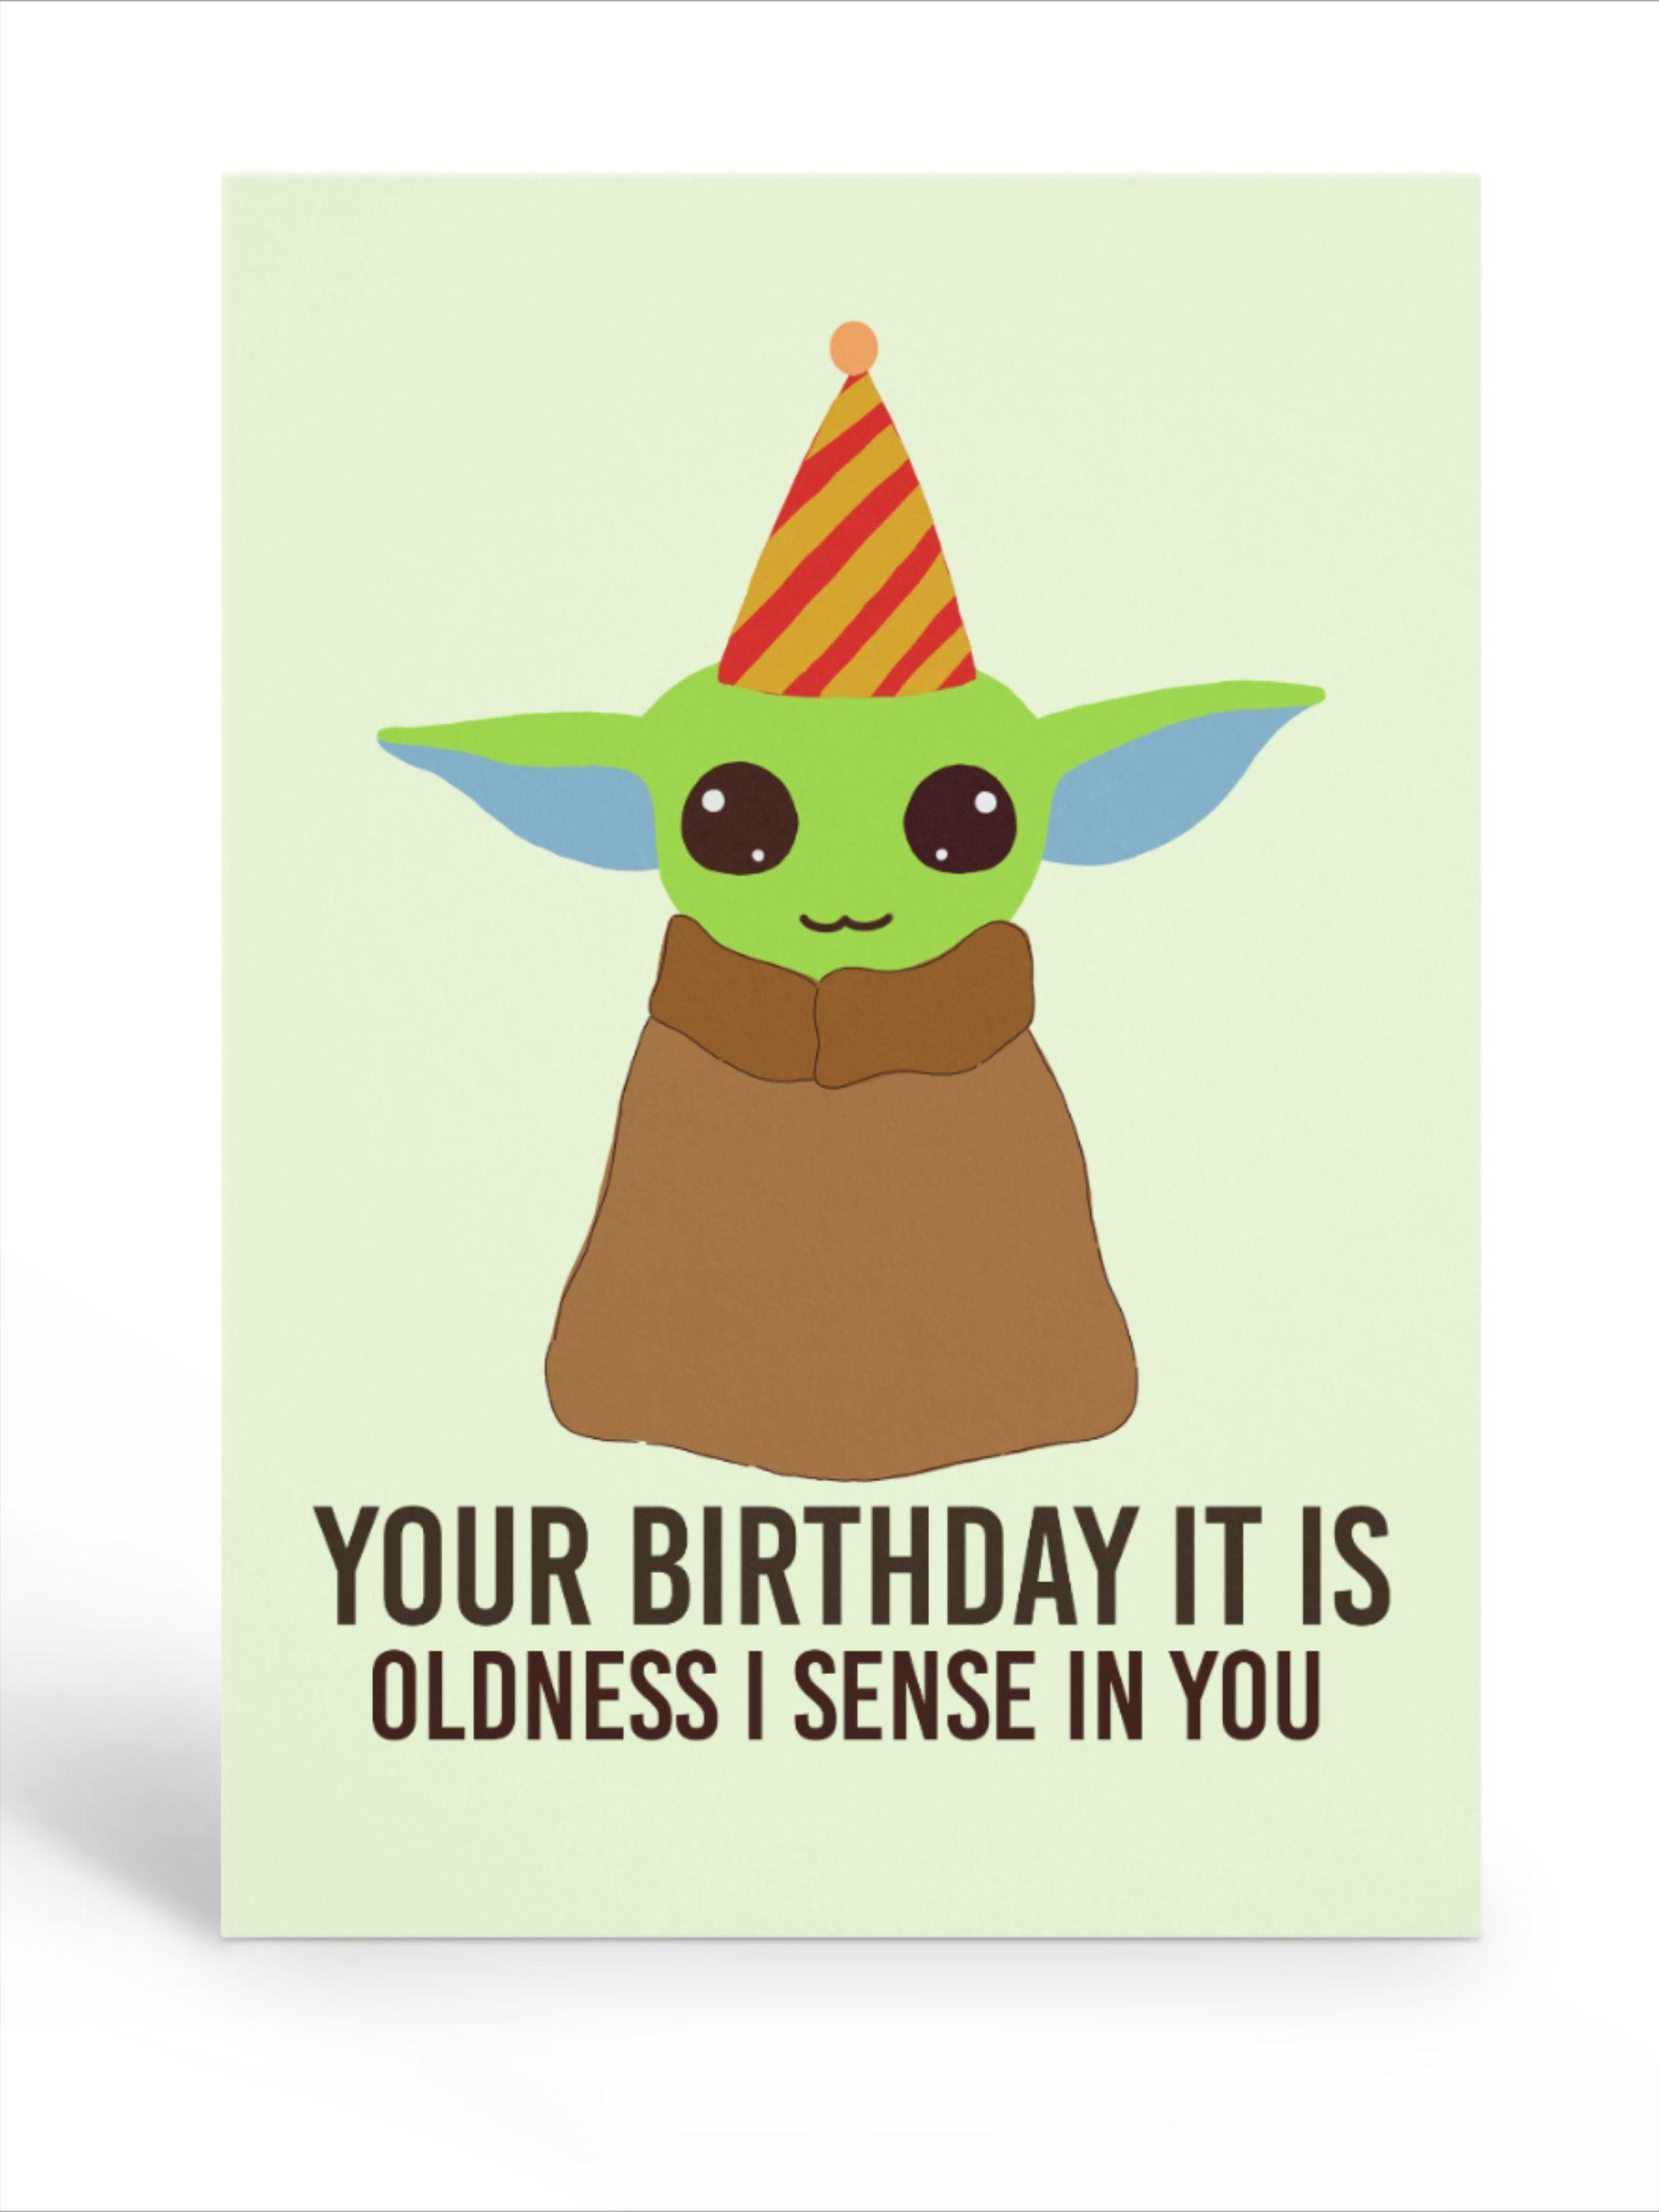 Pin By Mary Scharff On Baby Yoda Yoda Happy Birthday Yoda Funny Yoda Images